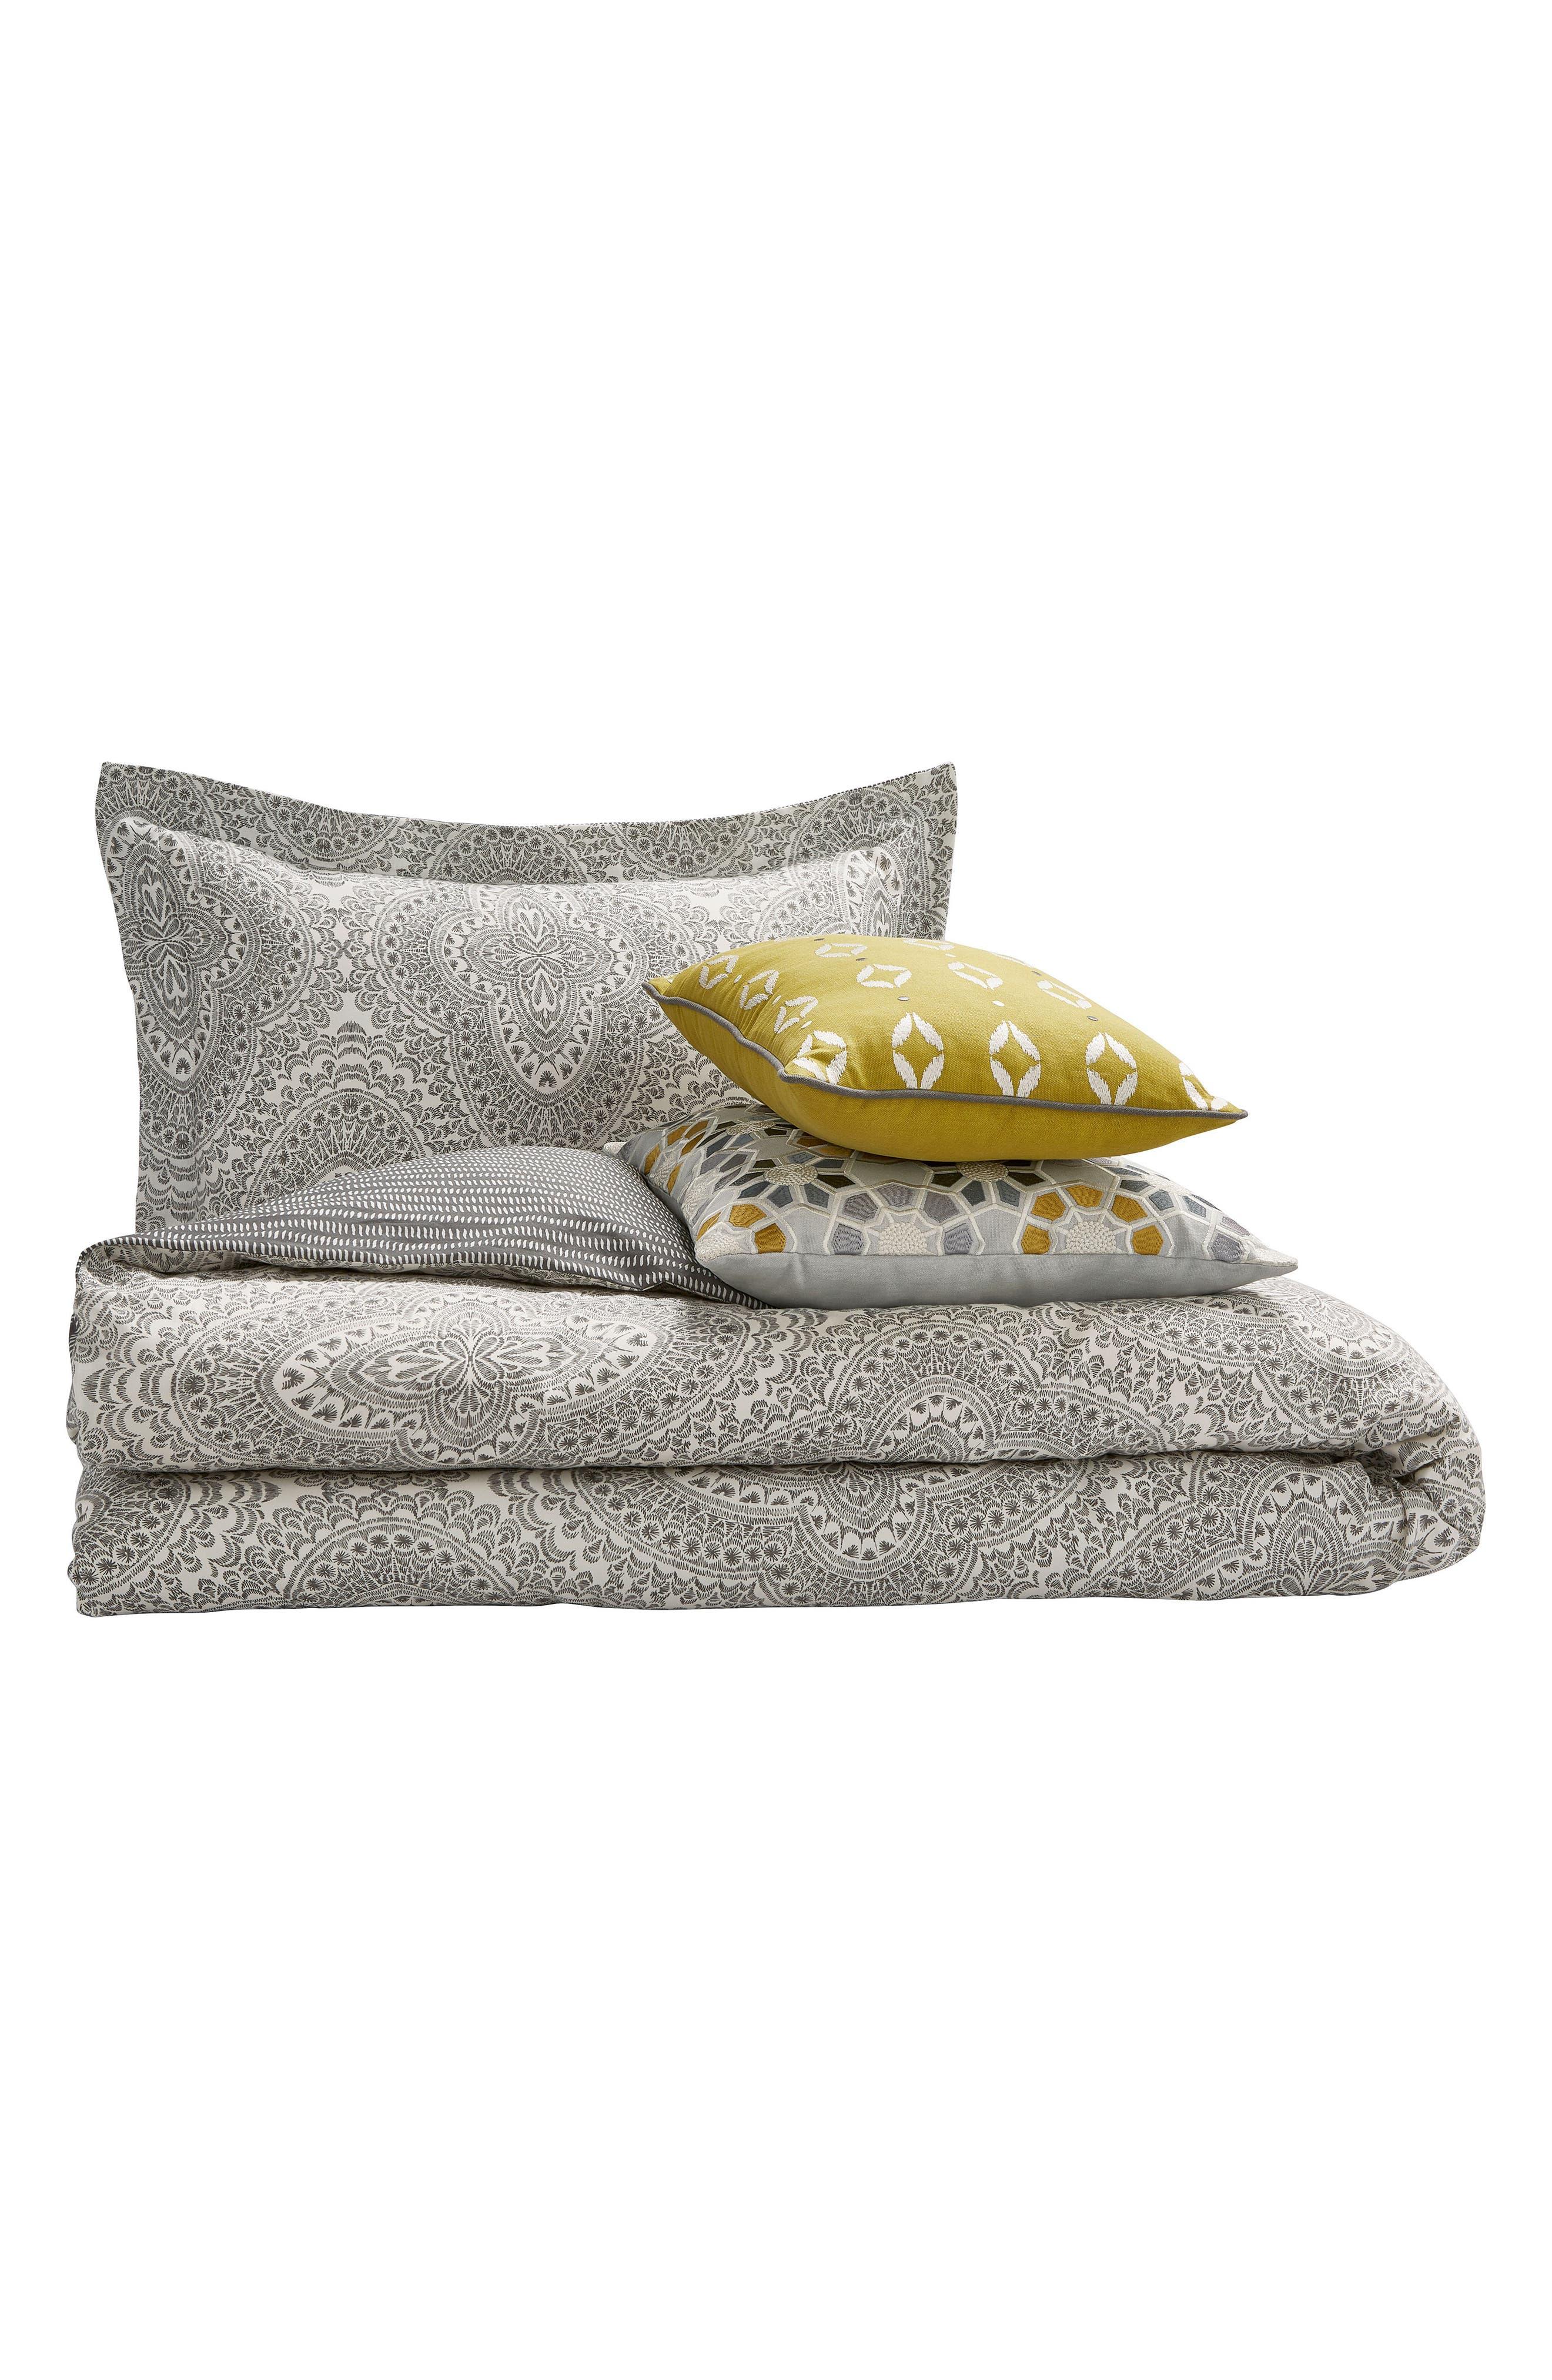 Ziba Duvet Cover, Sham & Accent Pillow Set,                             Alternate thumbnail 2, color,                             Grey